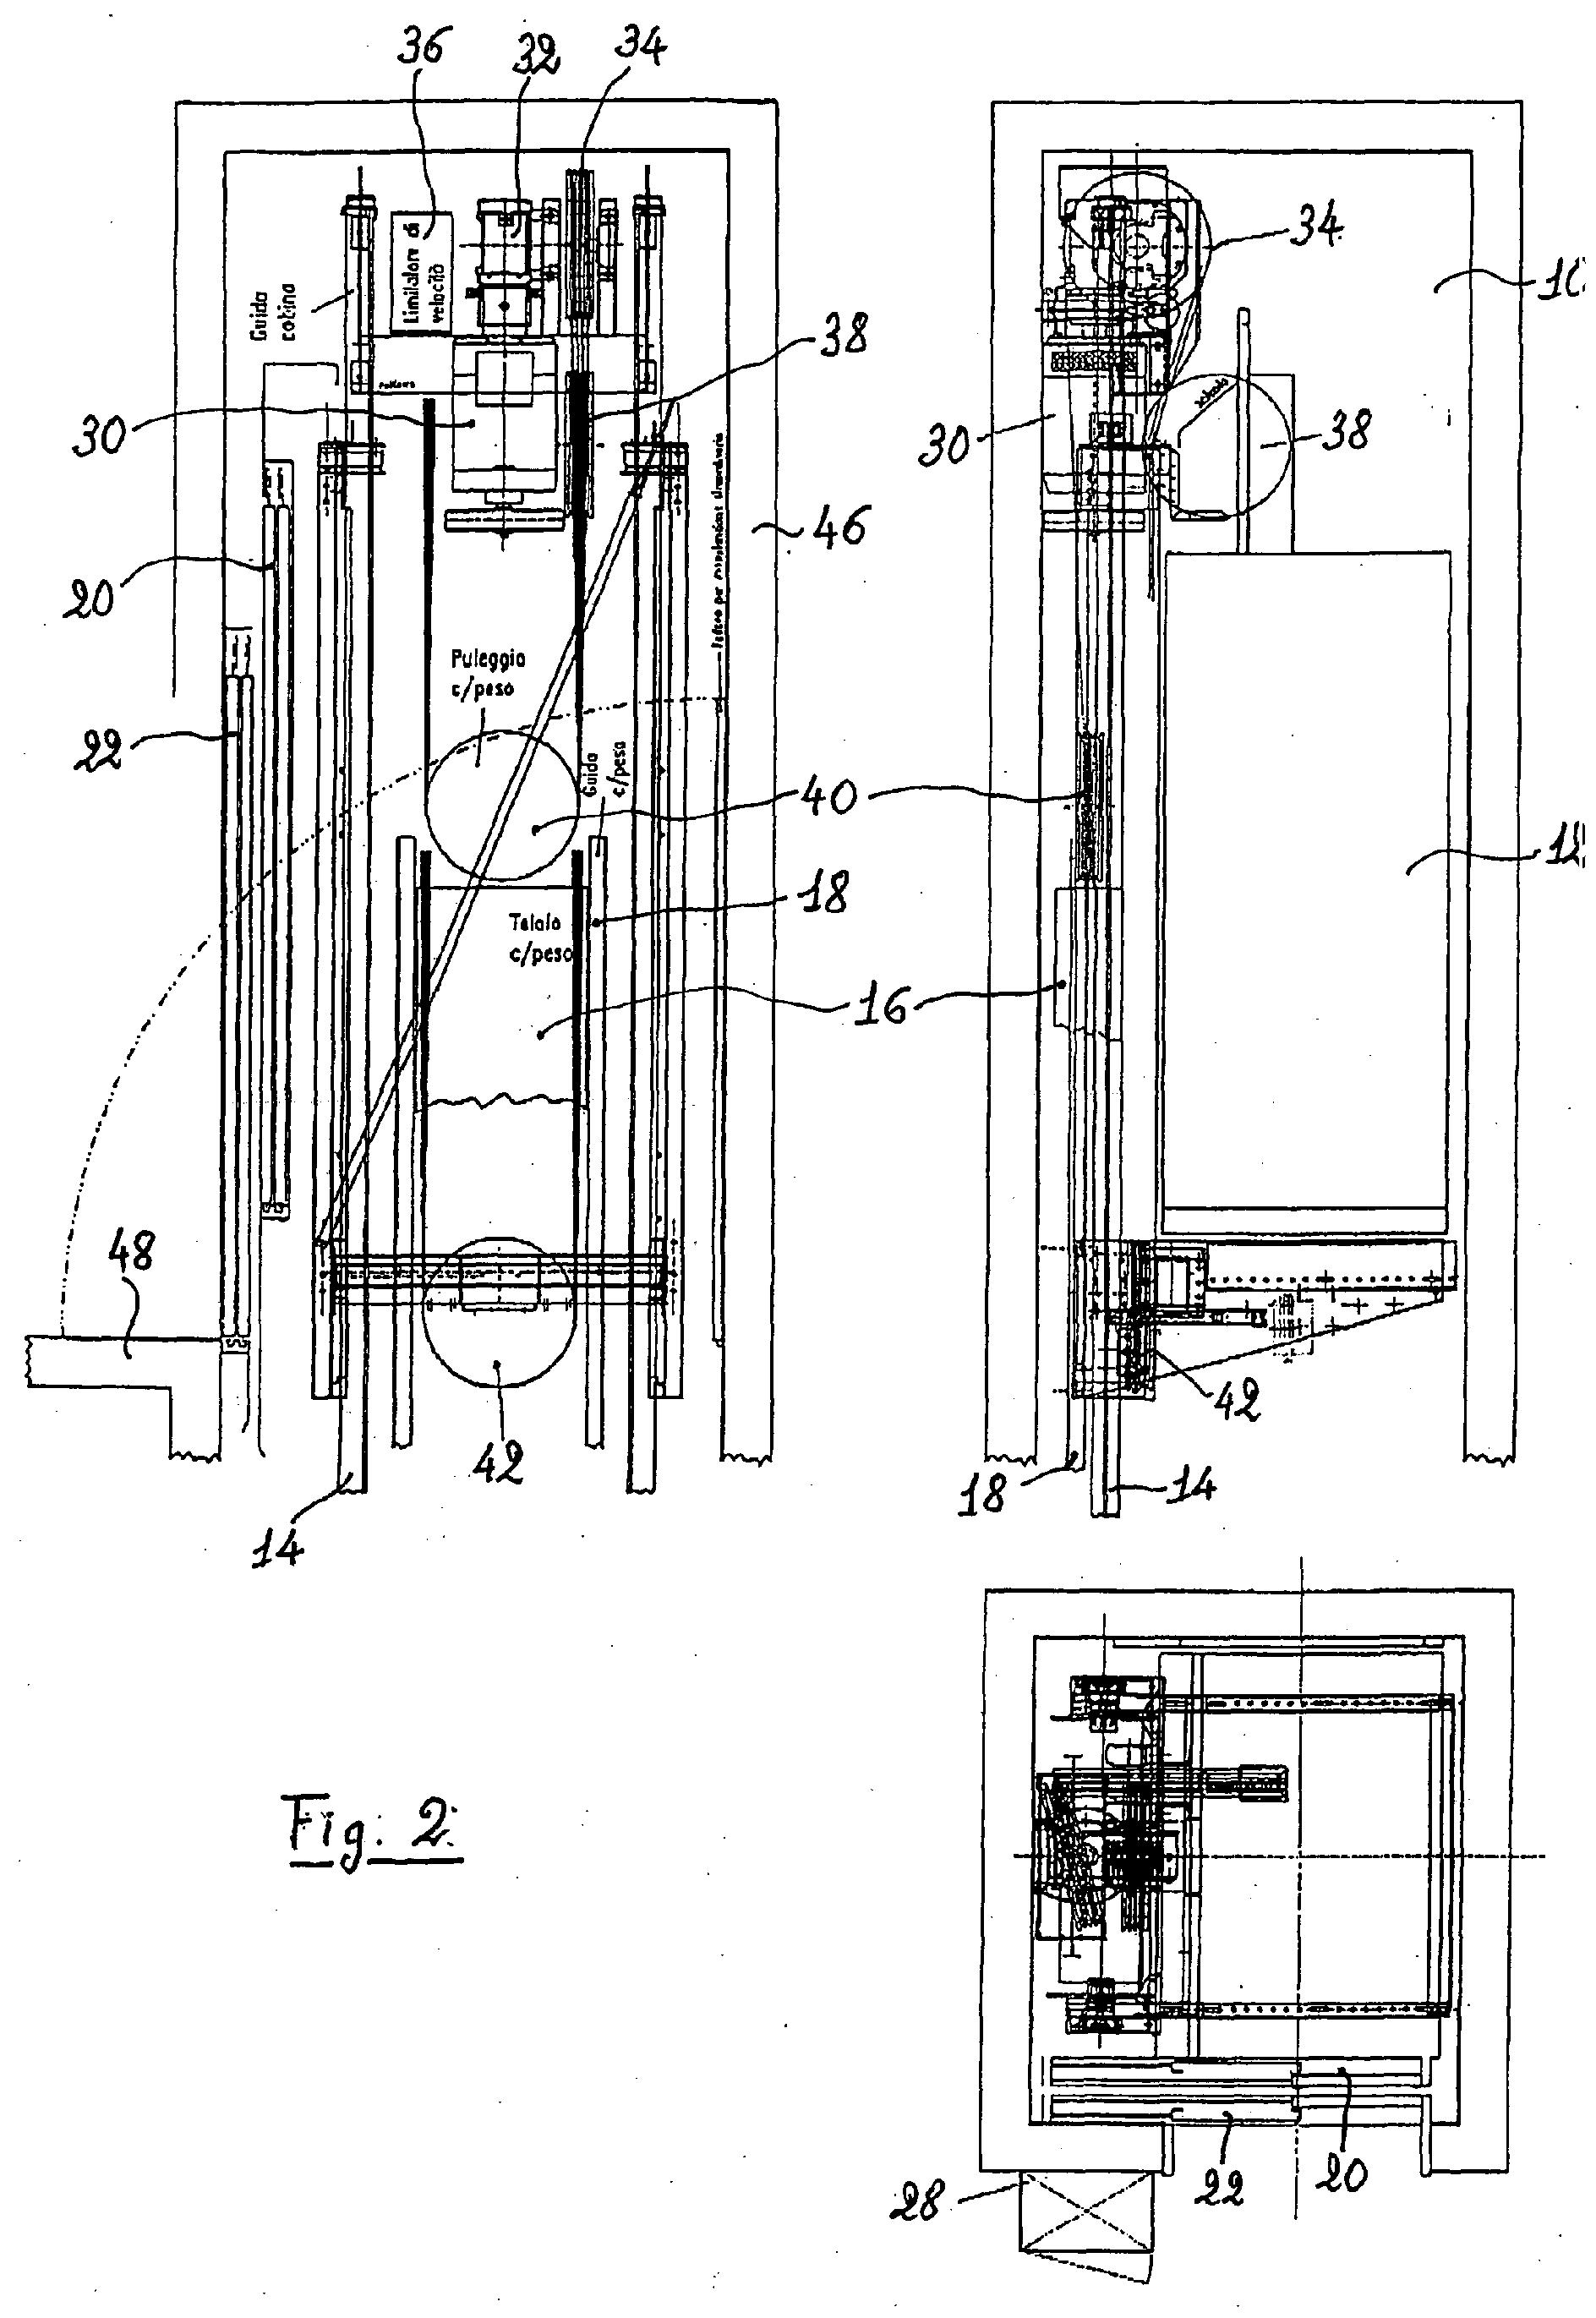 Patent Ep1422184a2 Machine Room Less Elevator Google